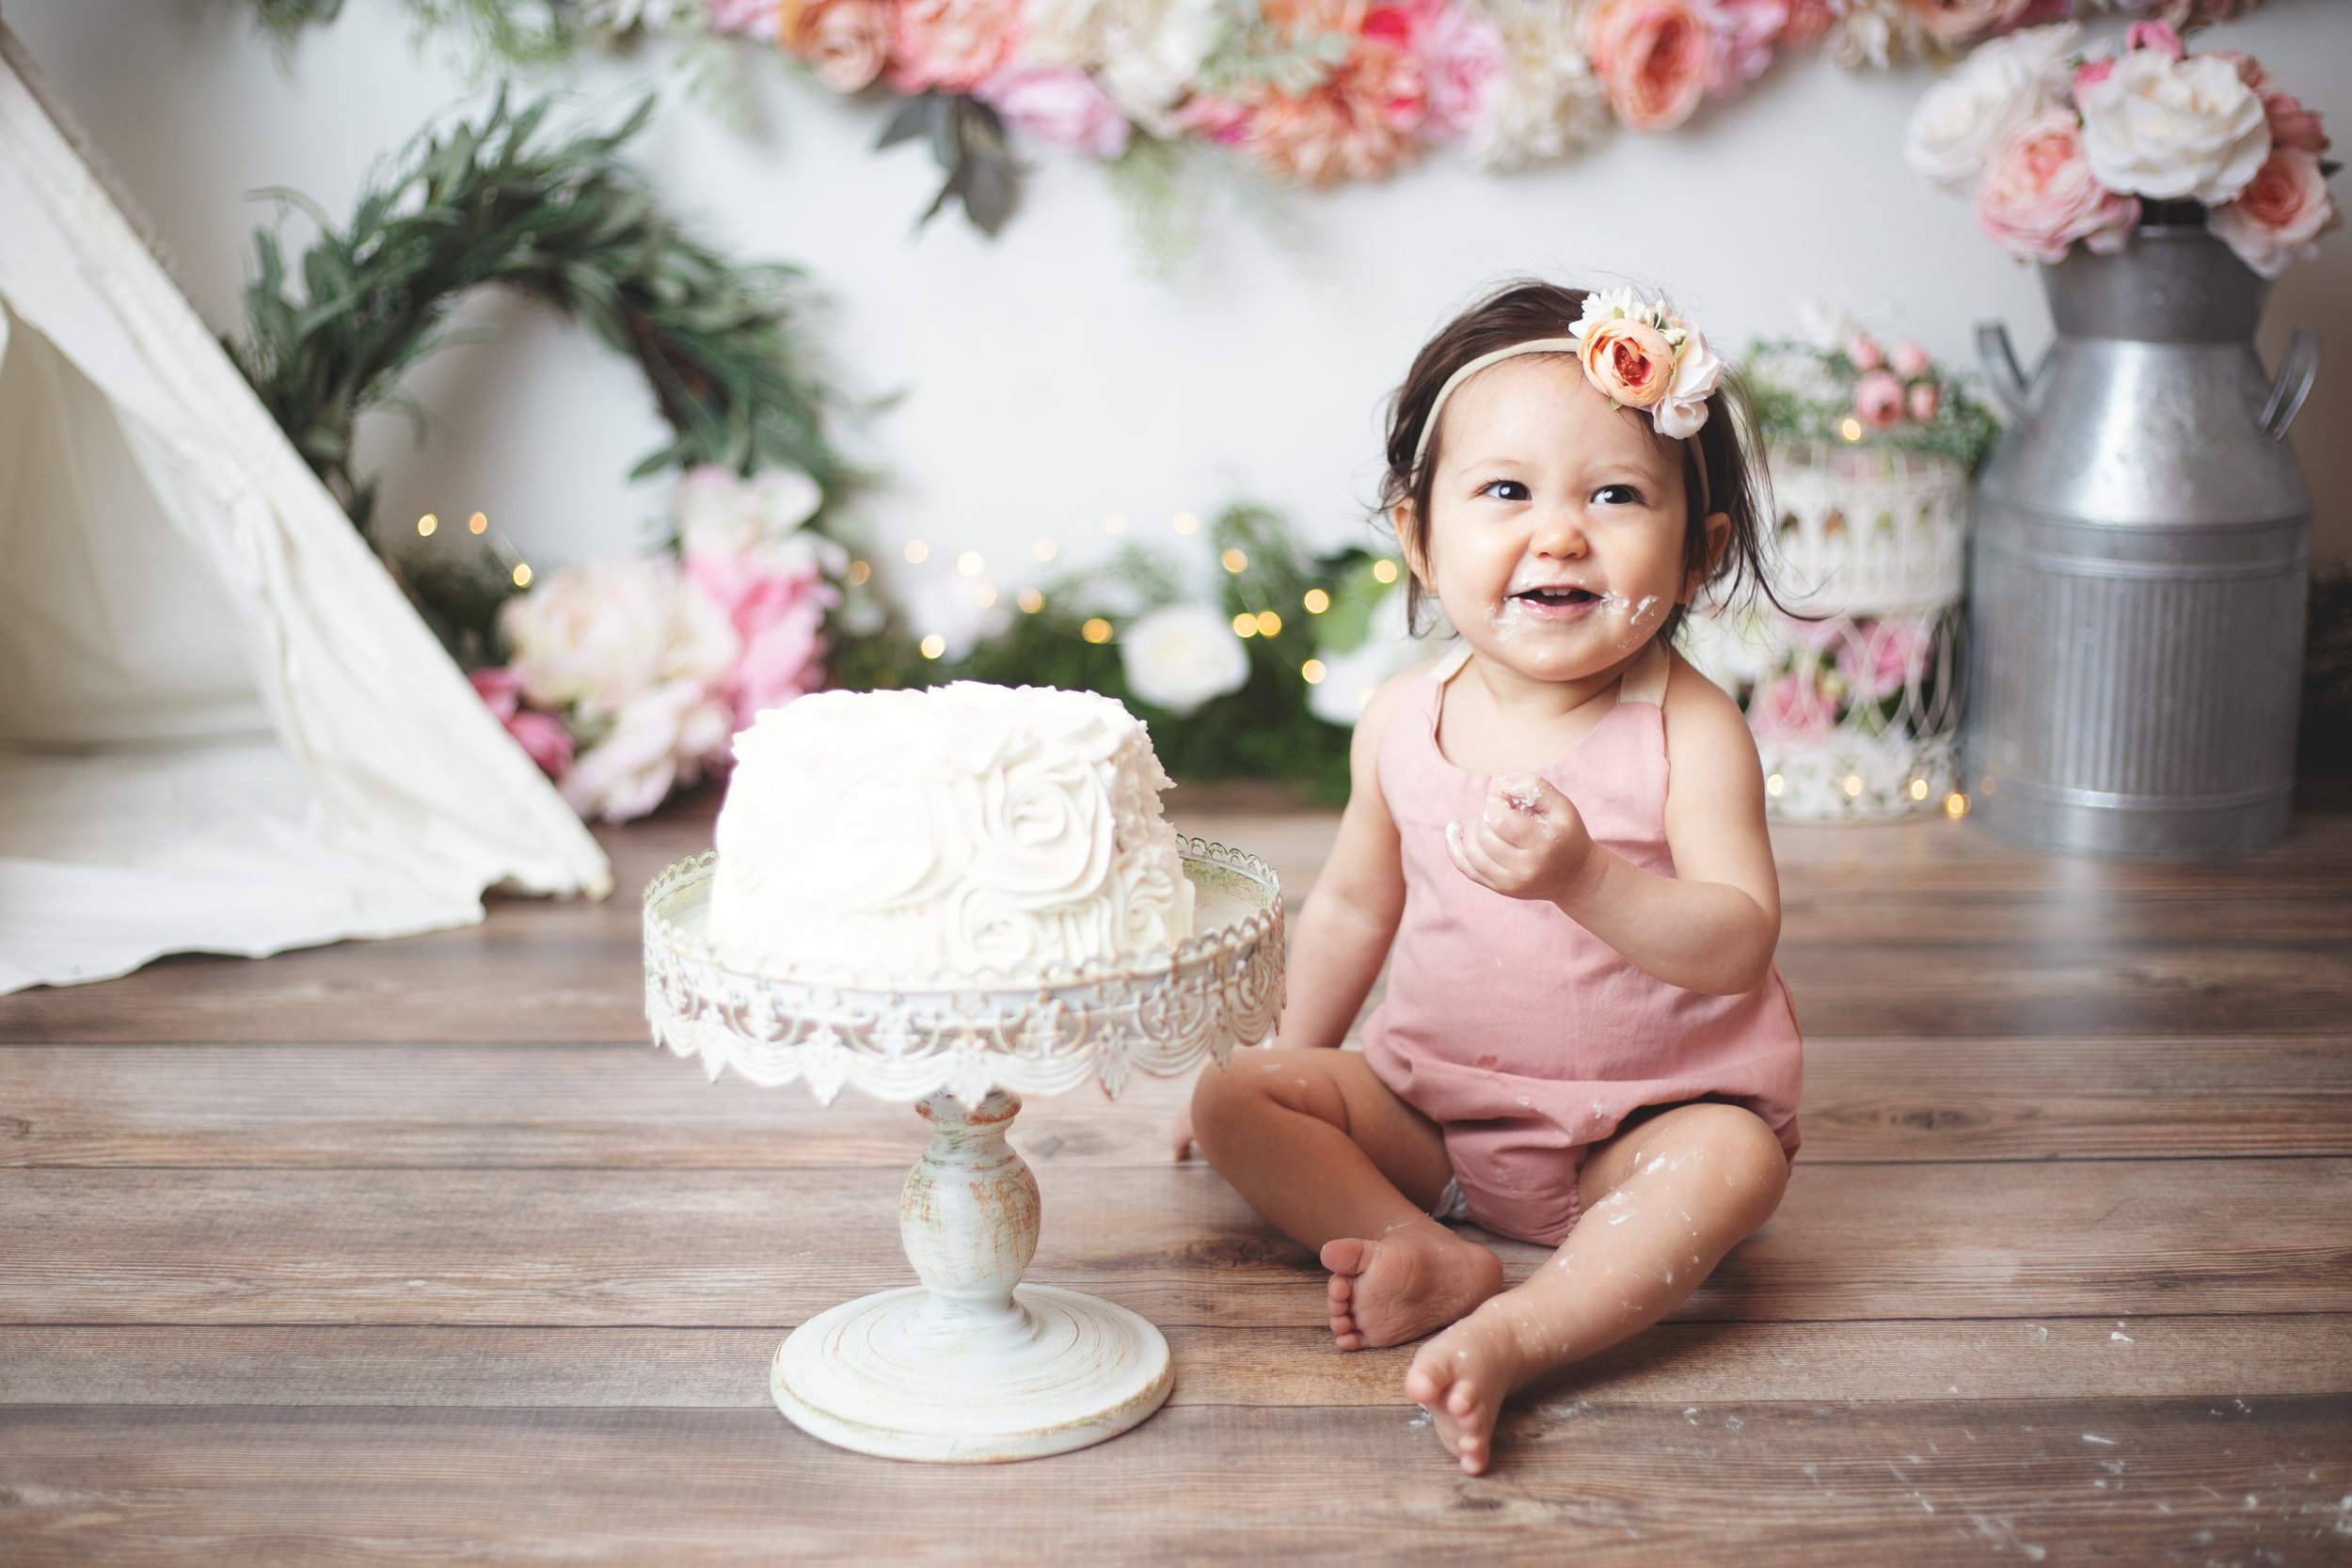 anchorage-cake-smash-photographer-9.jpg